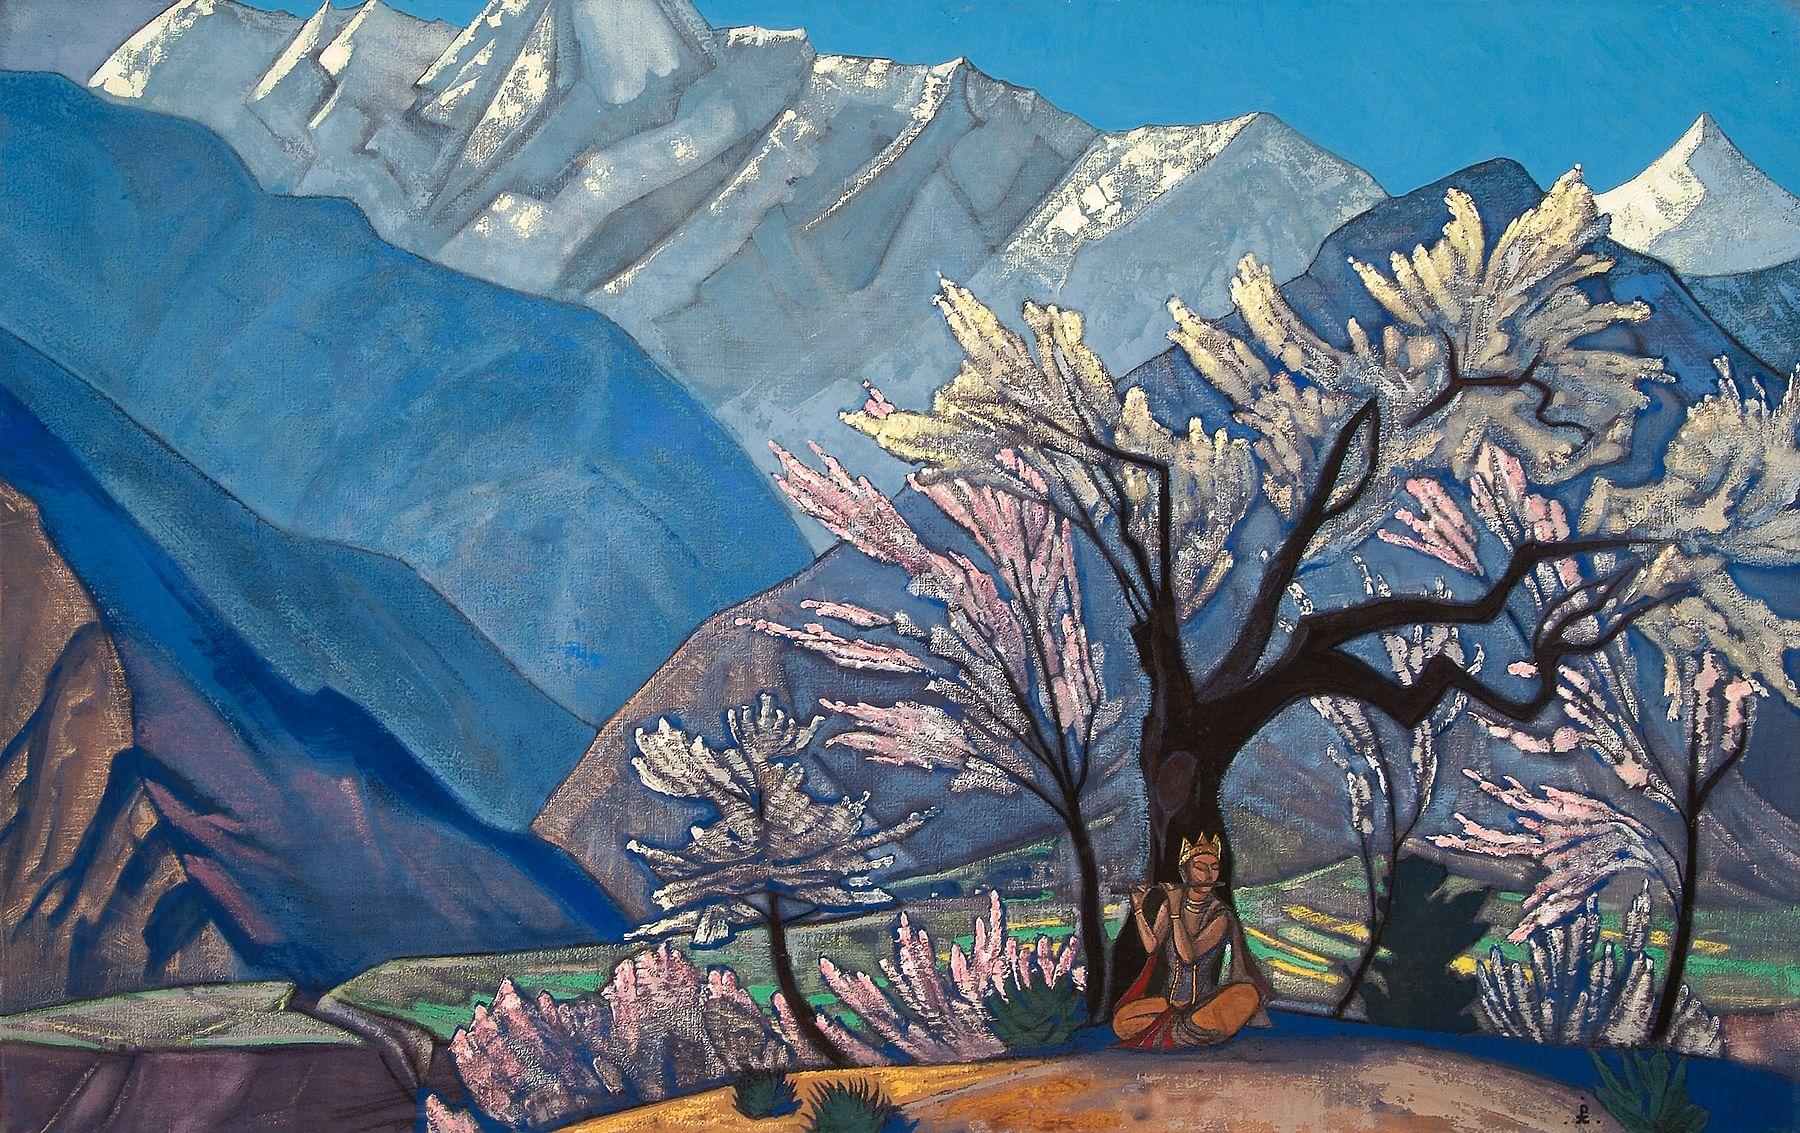 krishna-spring-in-kulu-1930